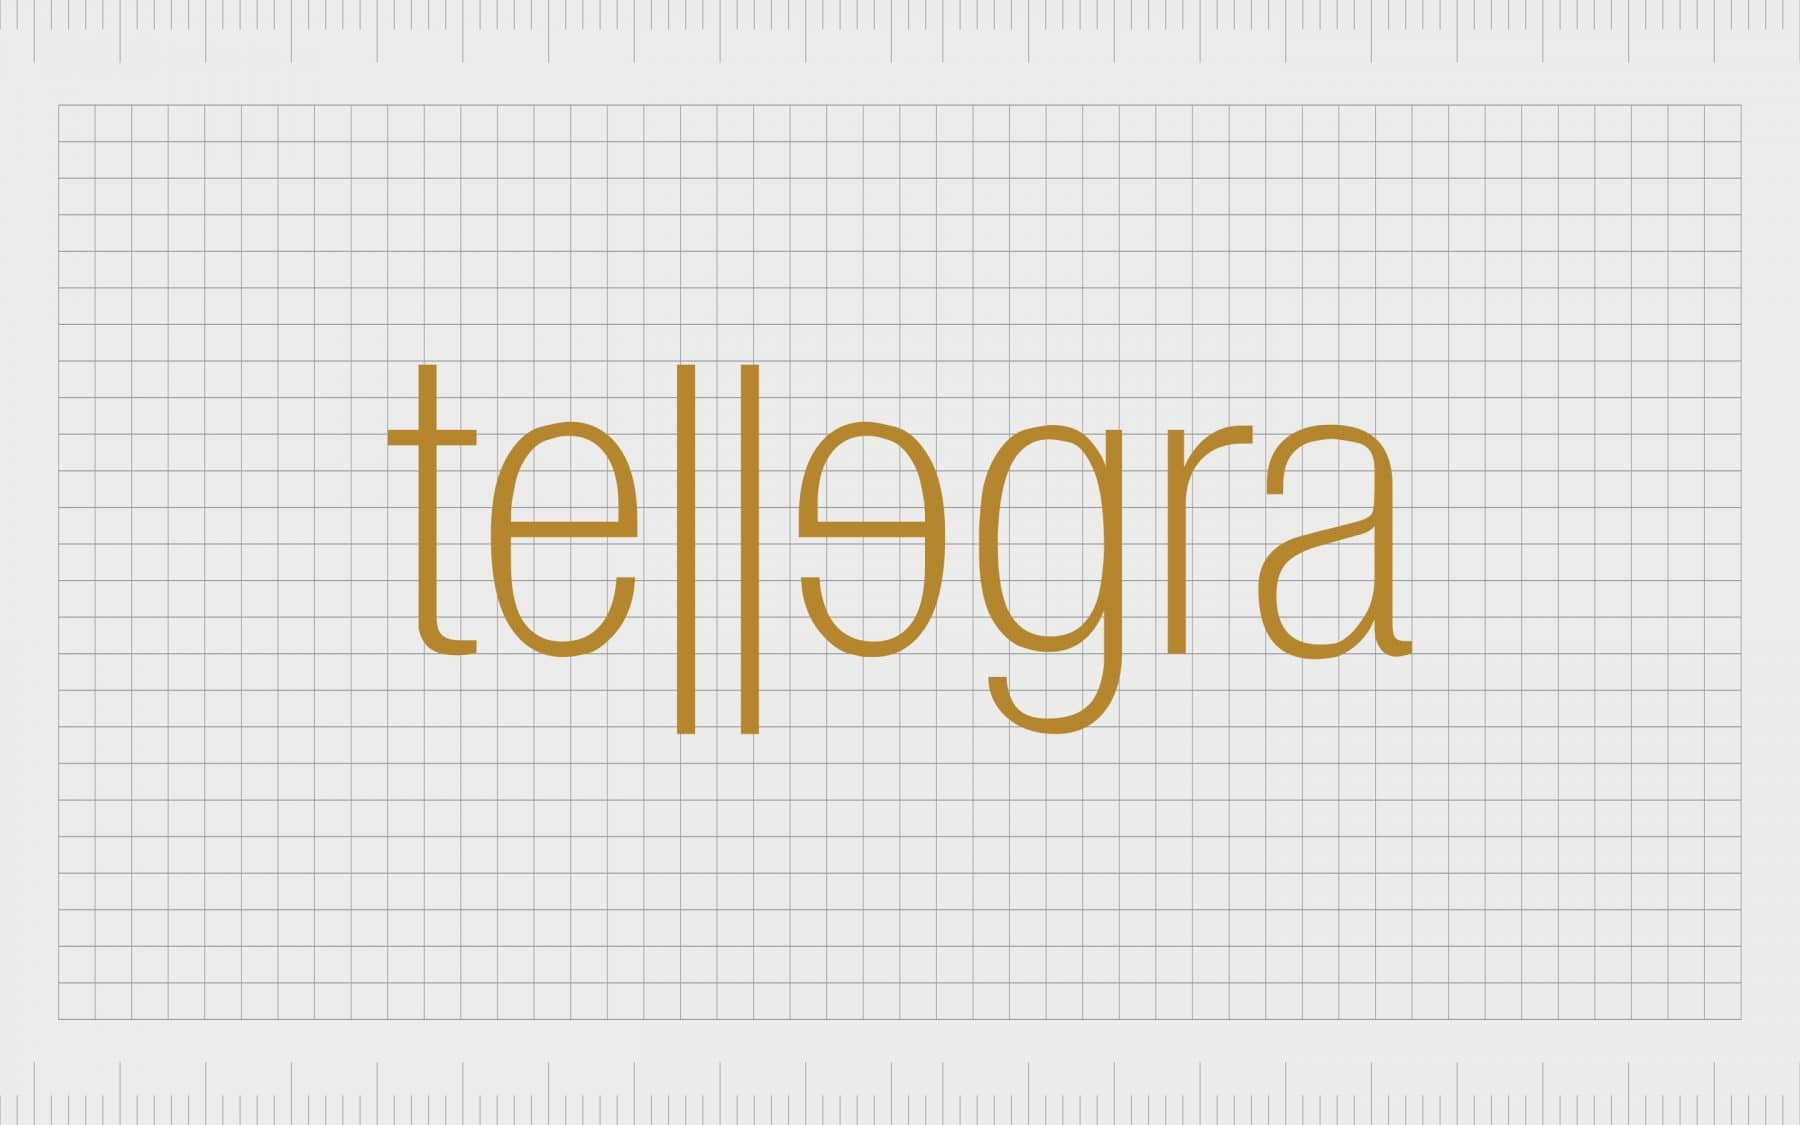 Tellegra